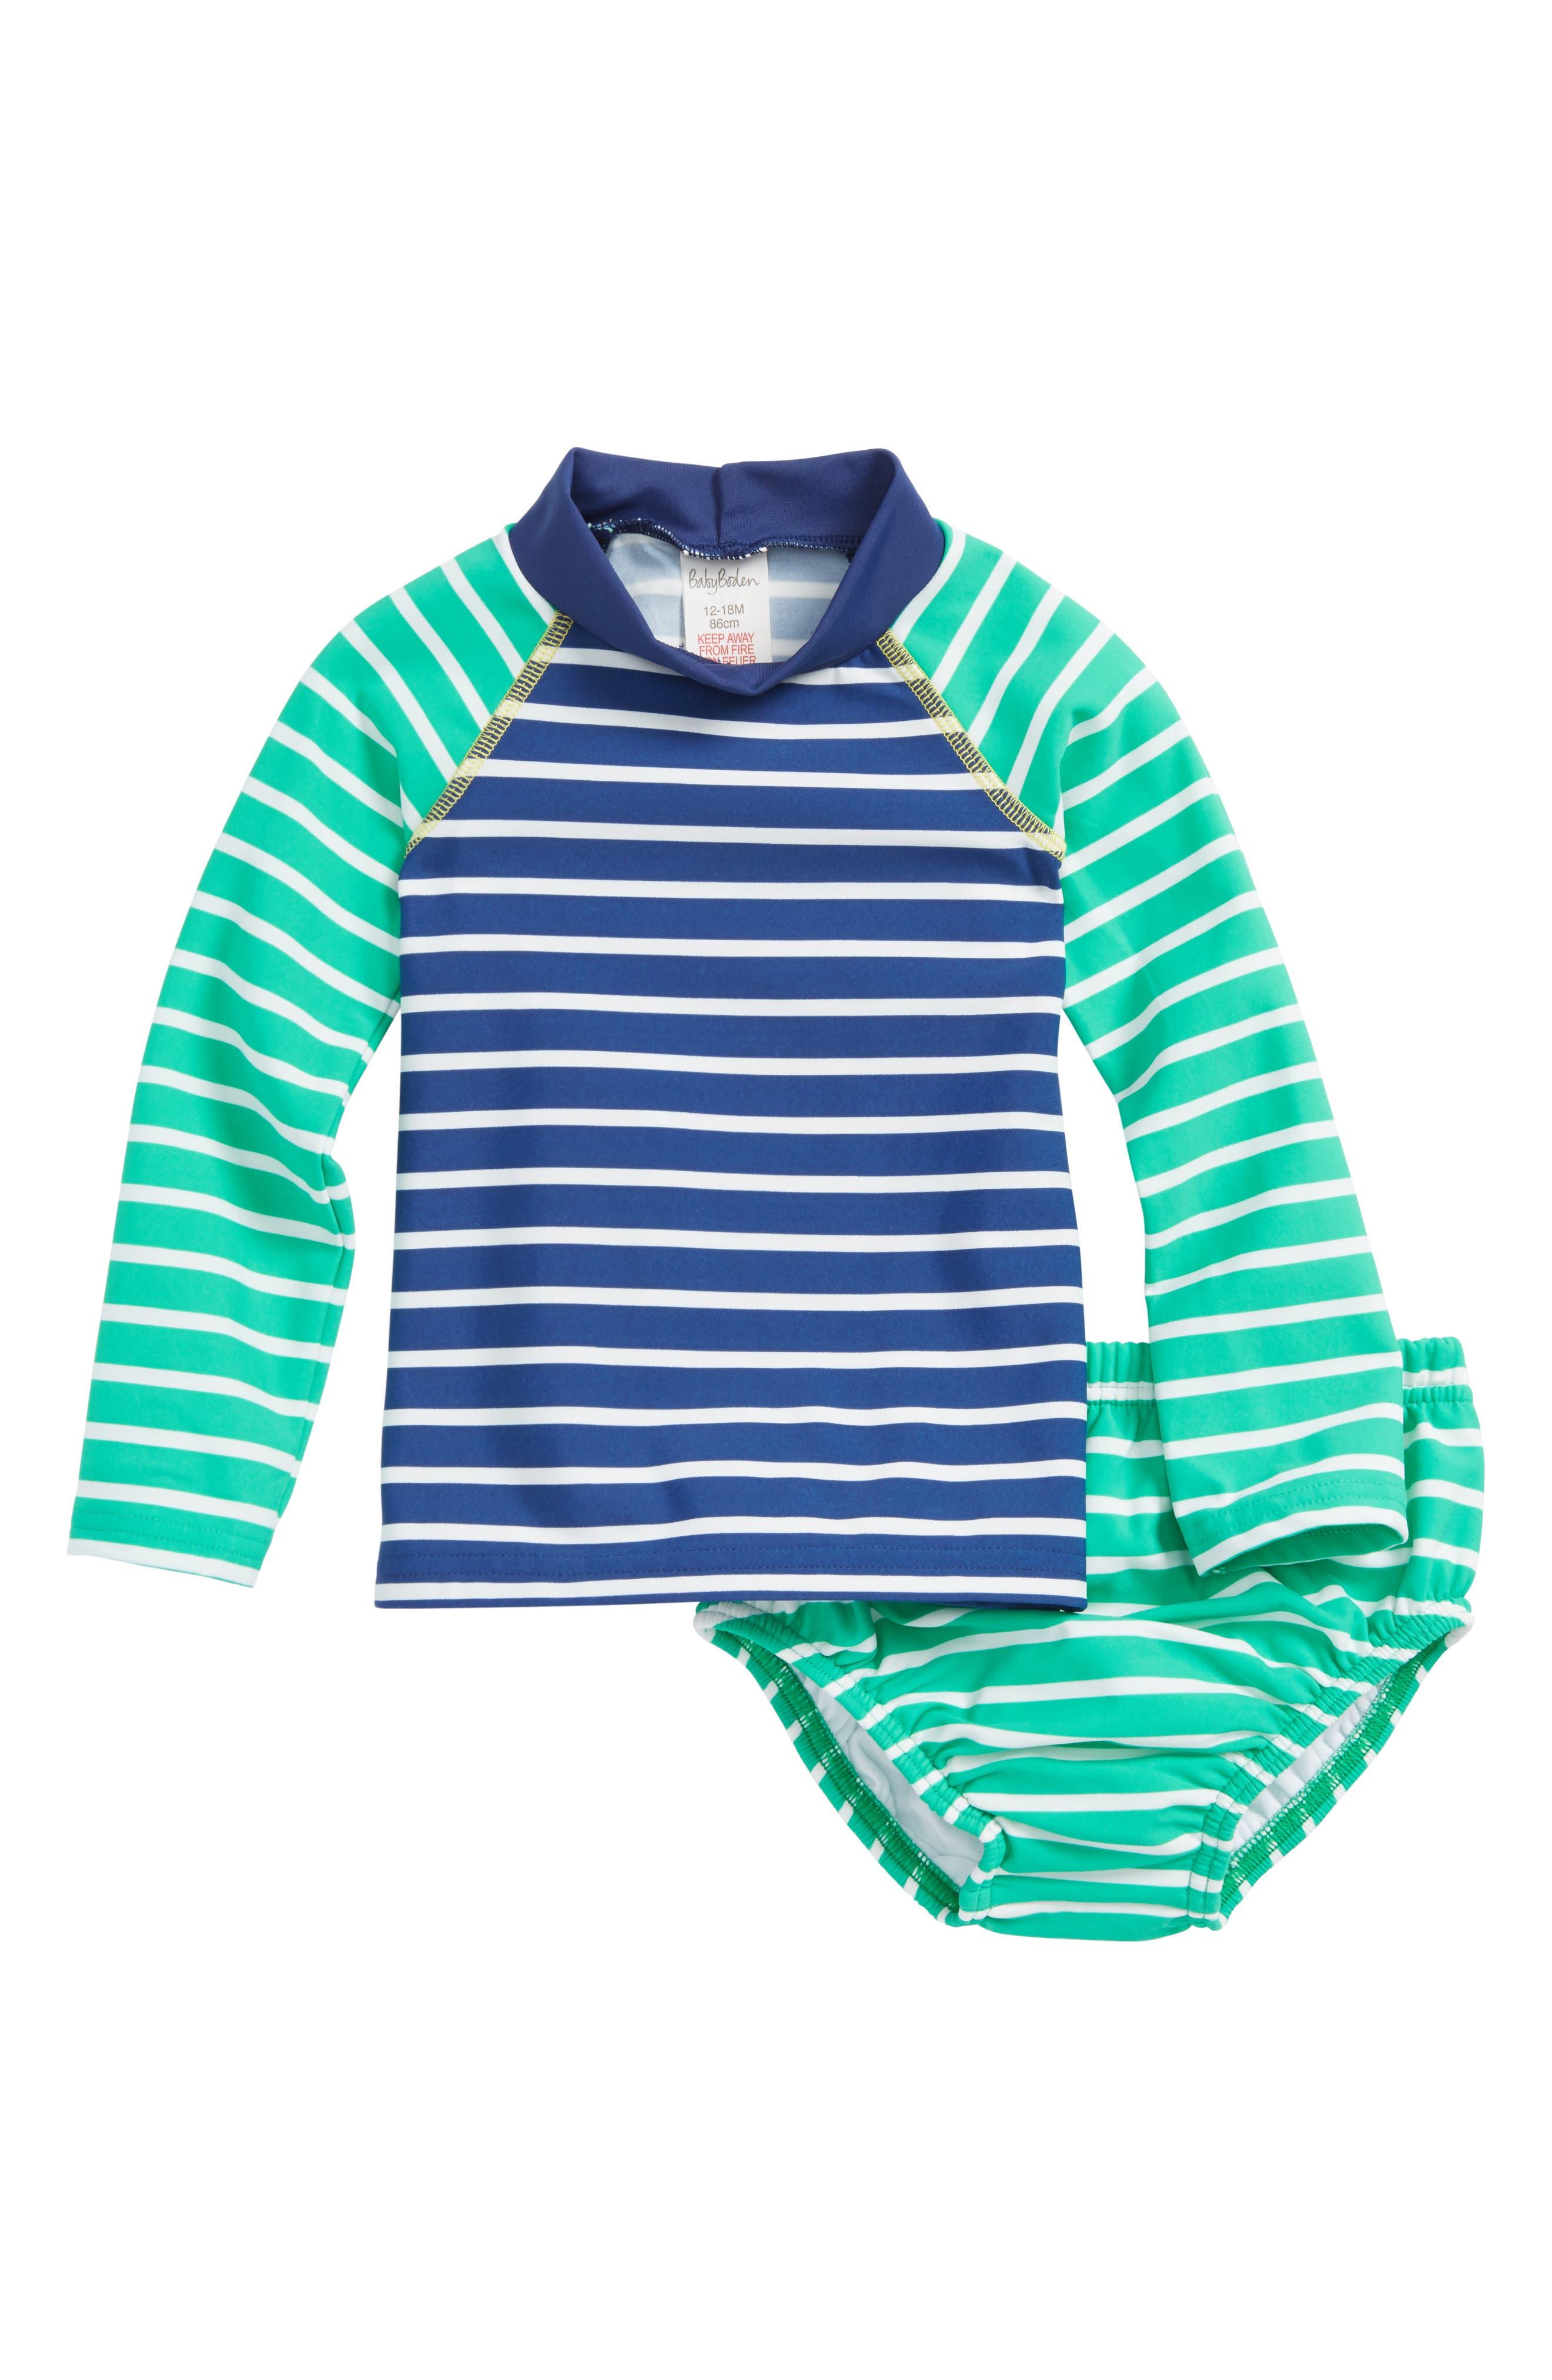 Two-Piece Rashguard Swimsuit,                         Main,                         color, Astro Green/ Deep Sea